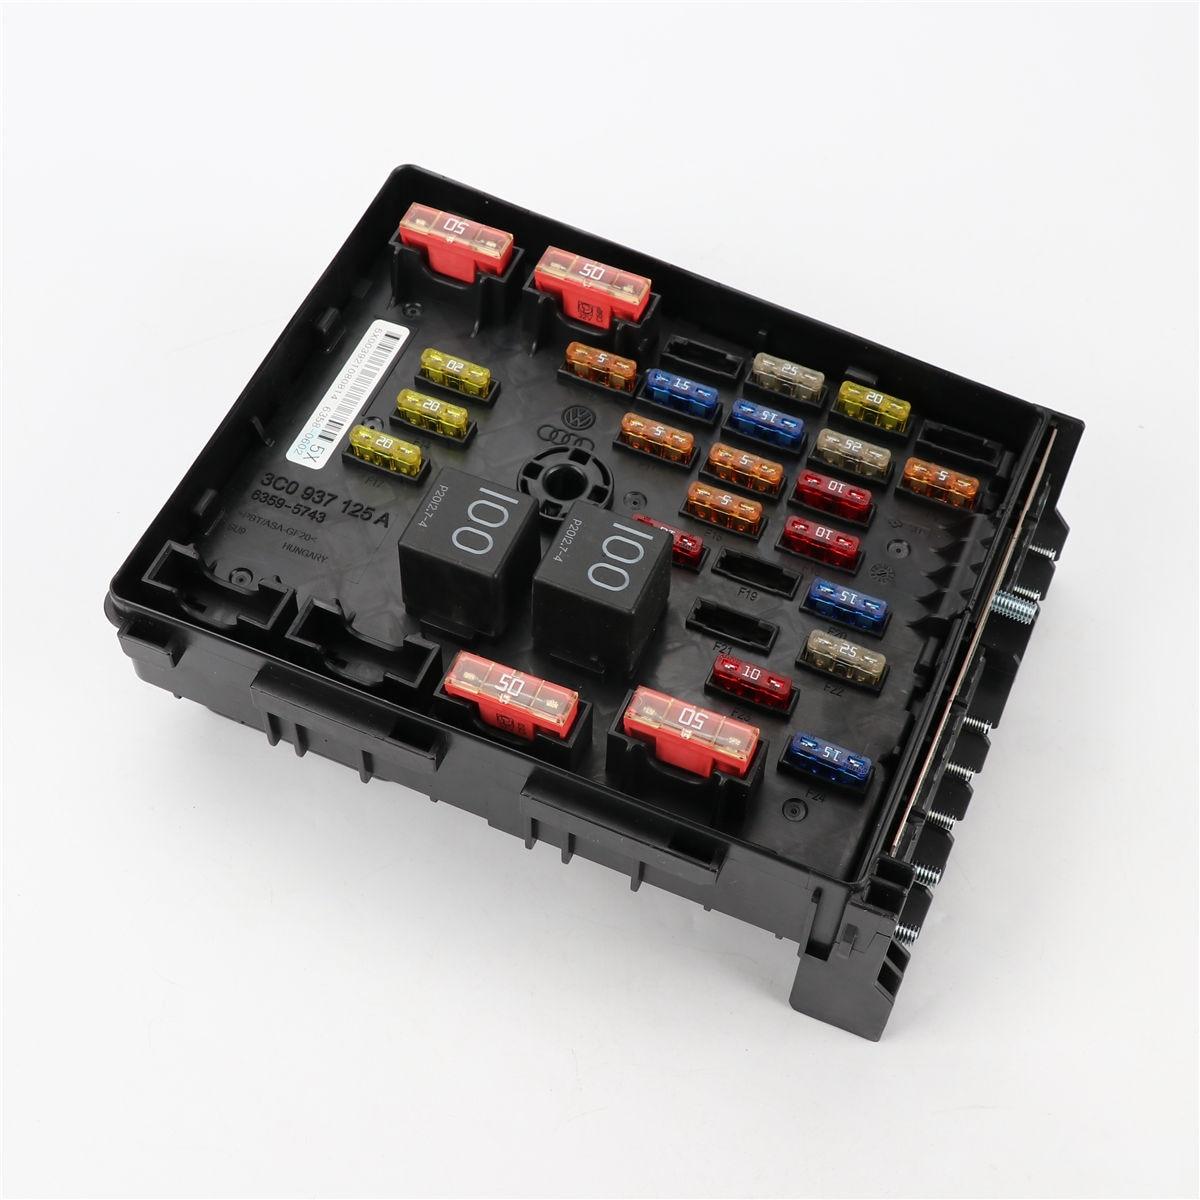 OEM Main Relay Fuse Box for VW Passat B6 Tiguan CC AUDI Q3 SEAT Alhambra 3C0 937 125 A climatronic air condition control switch panel ac seat heater for passat b7 cc 35d 907 044 b c d 35d907044b c d